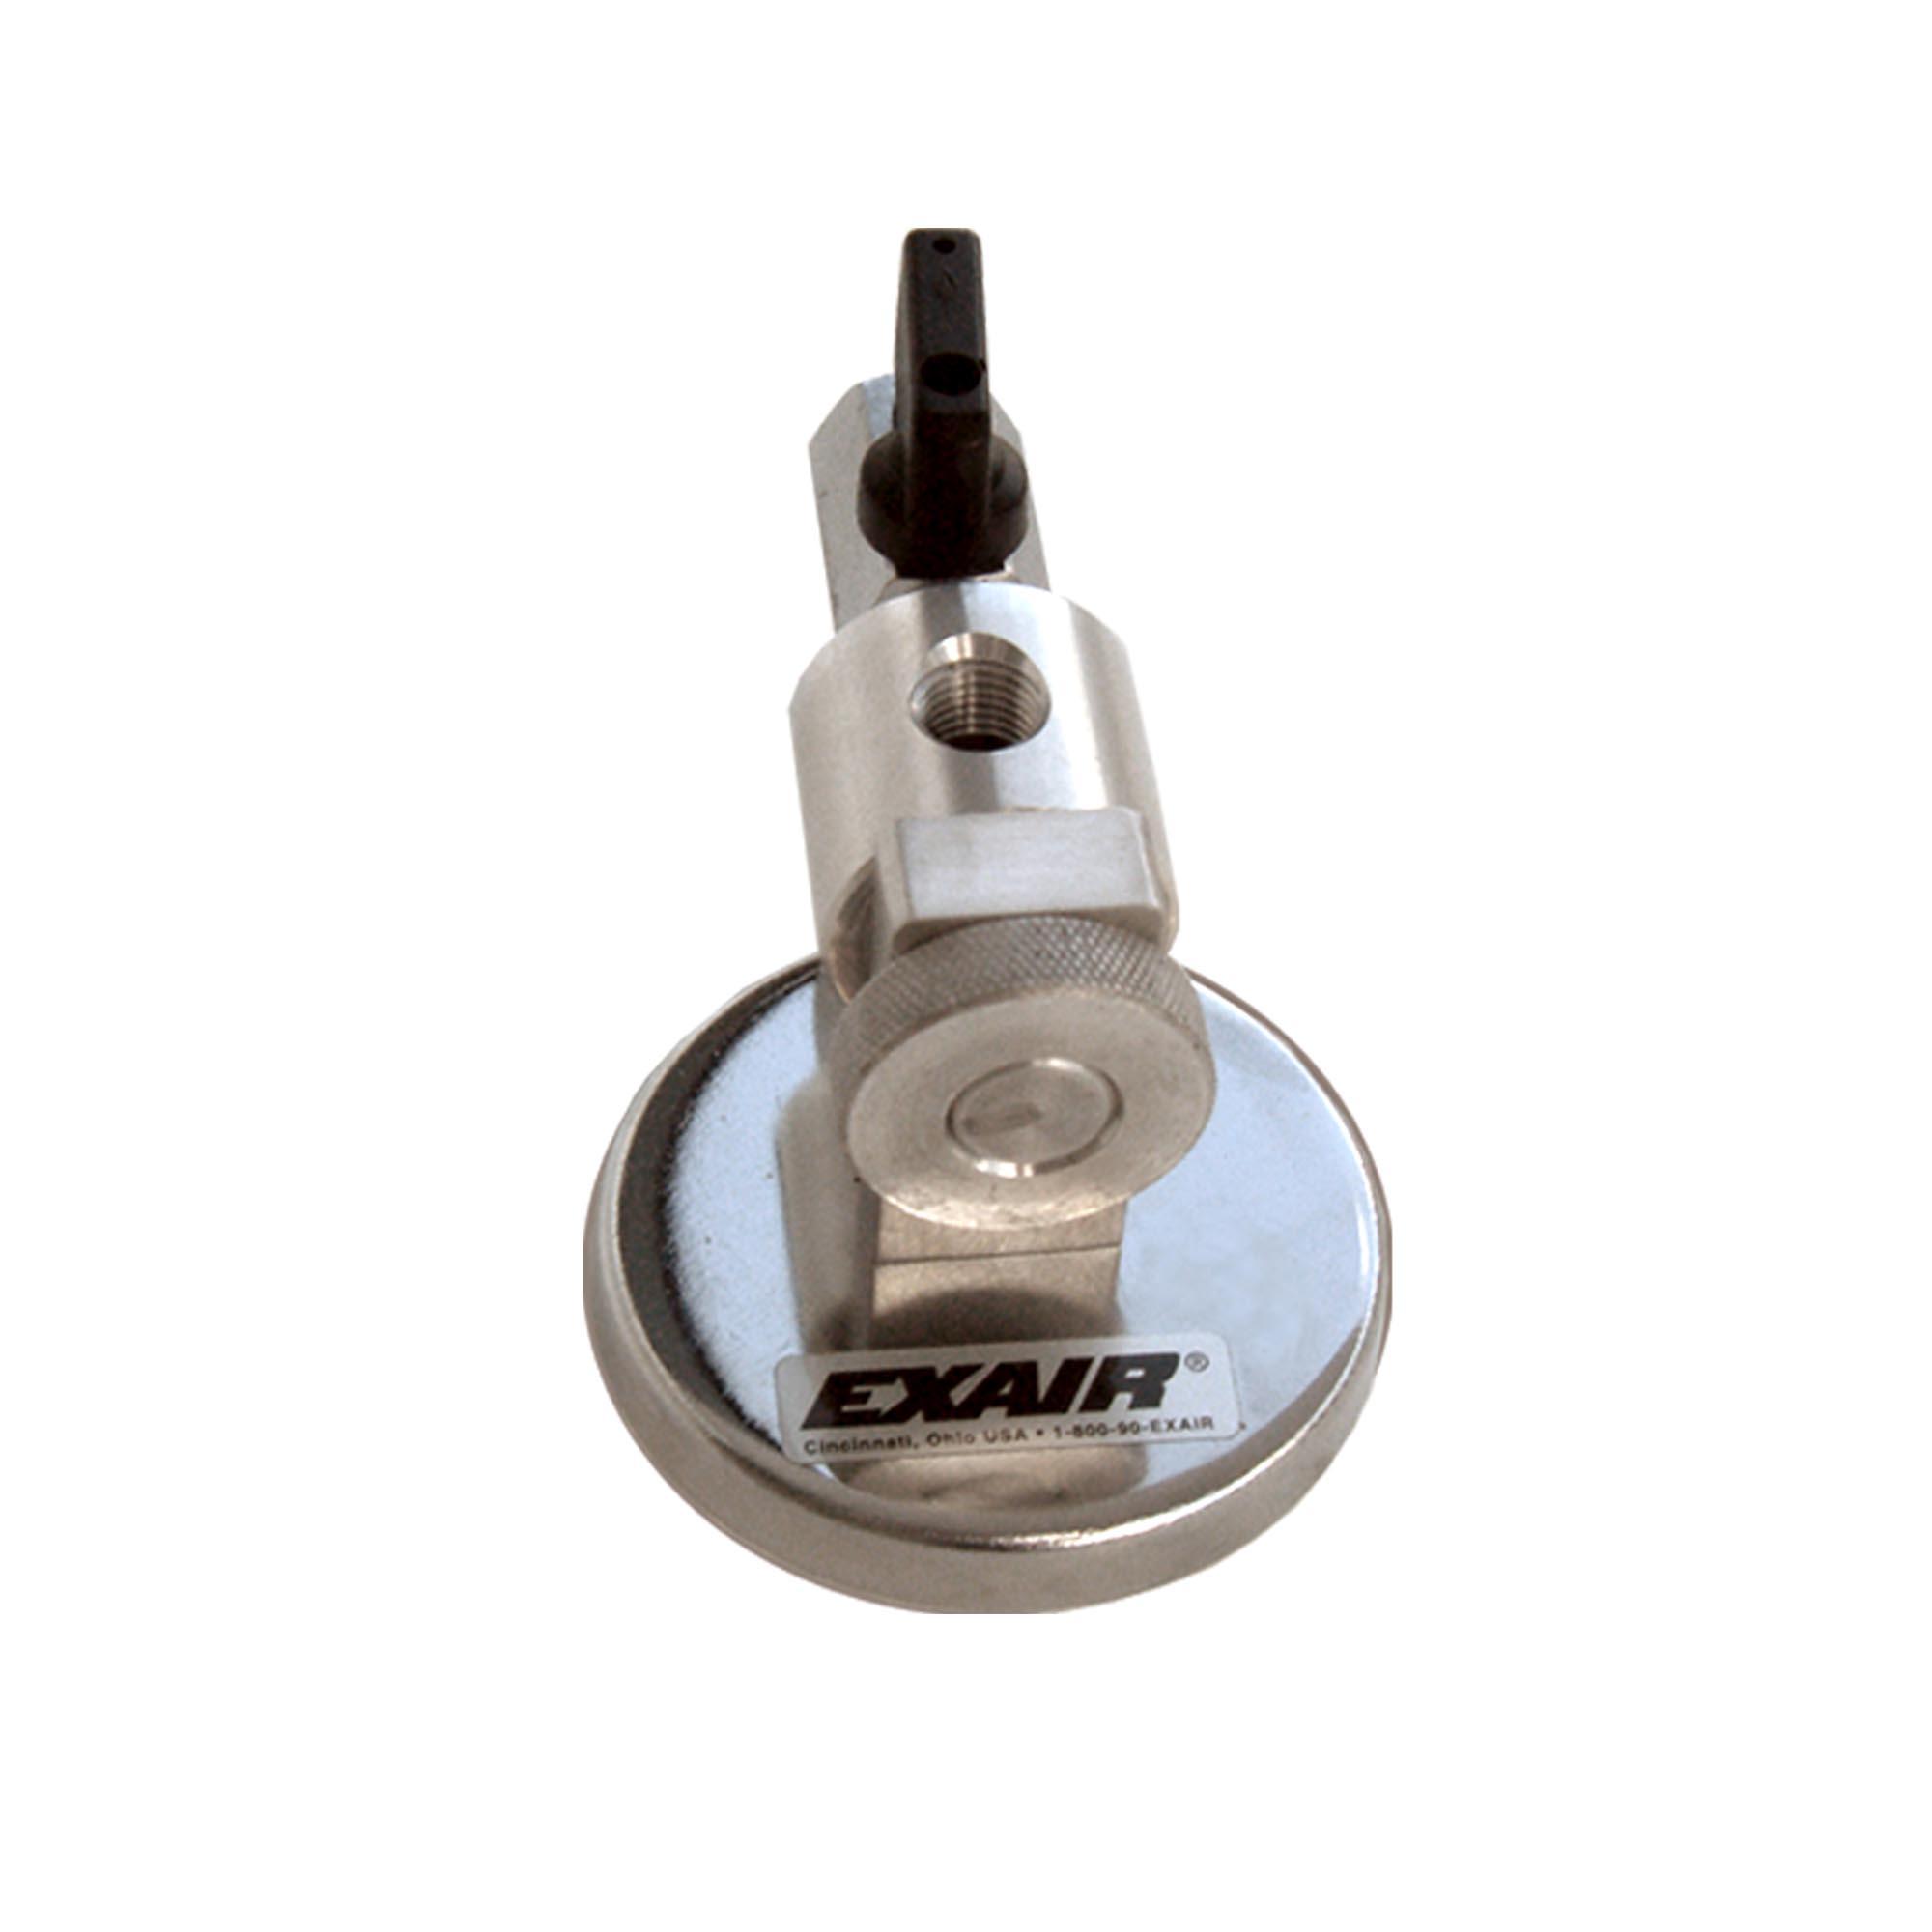 Model 9029 Swivel Magnetic Base, one outlet